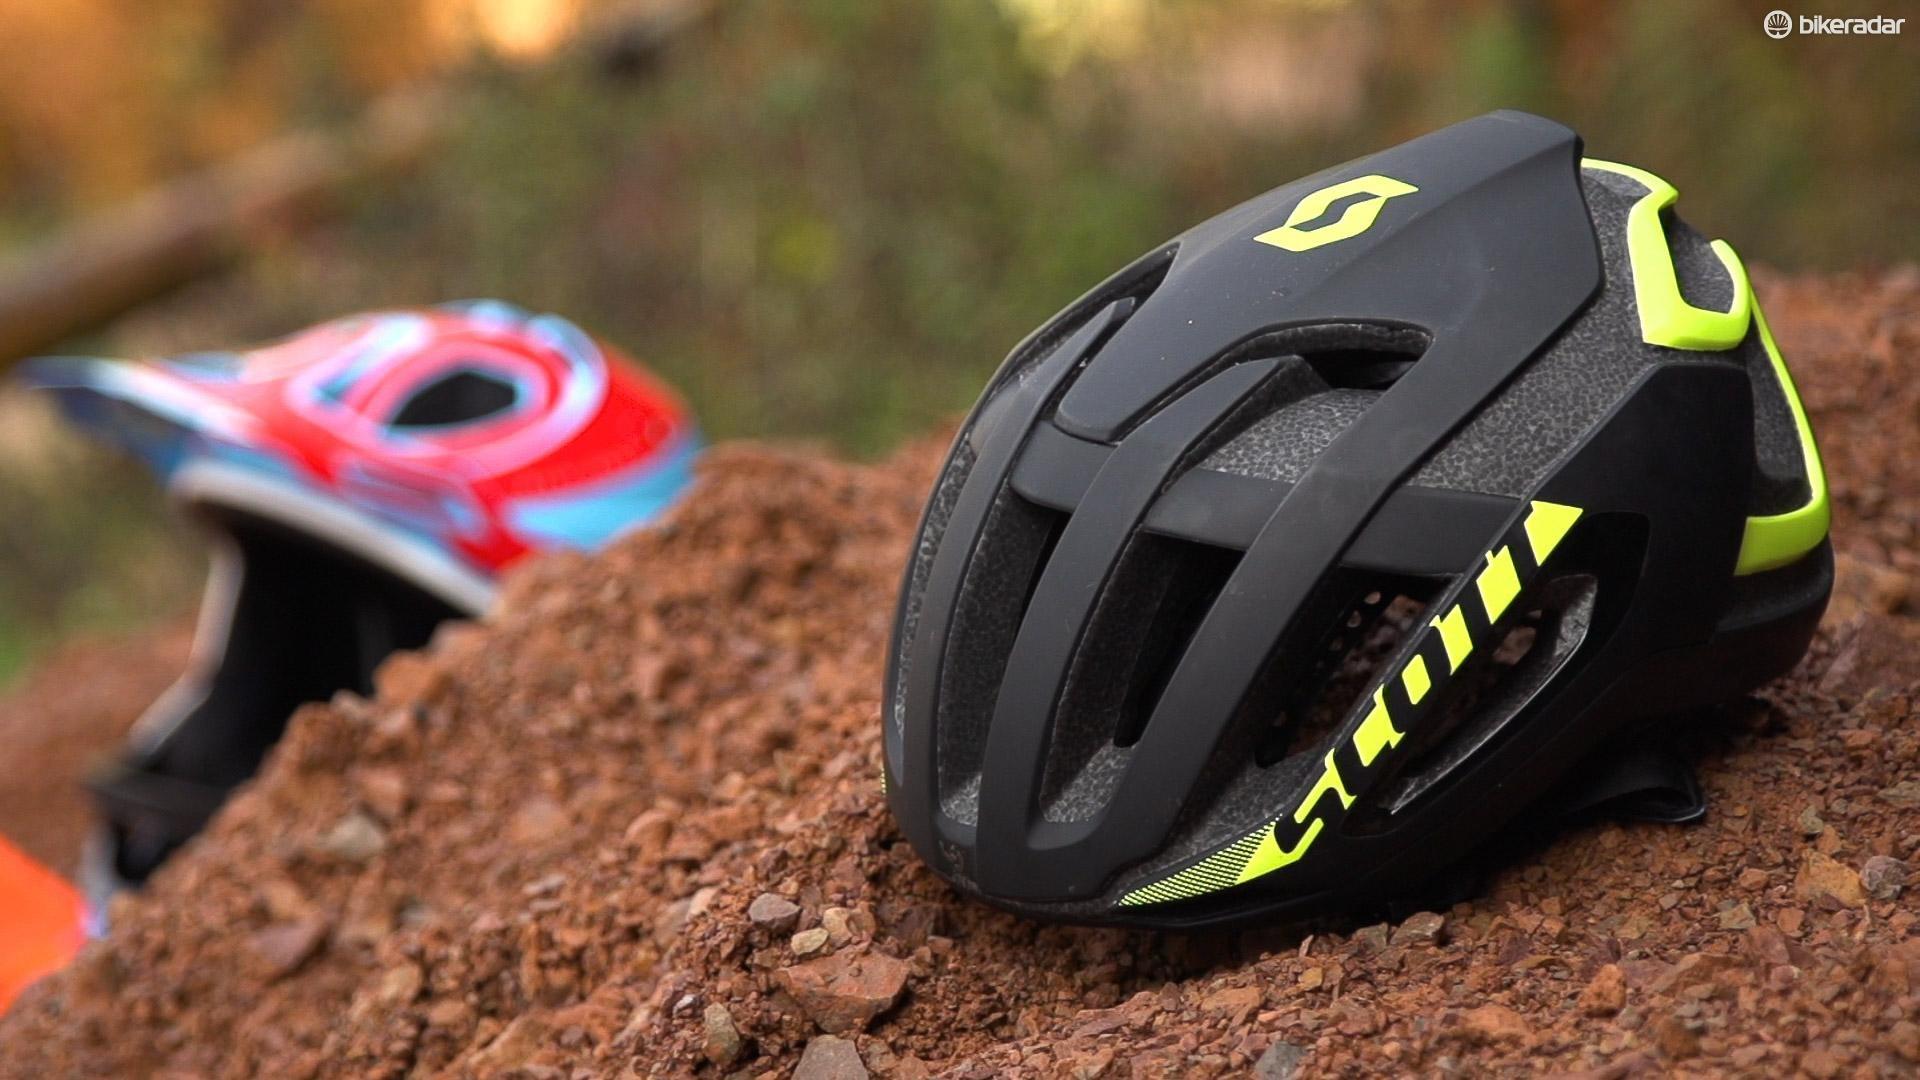 This is one of very few MTB specific aero helmets